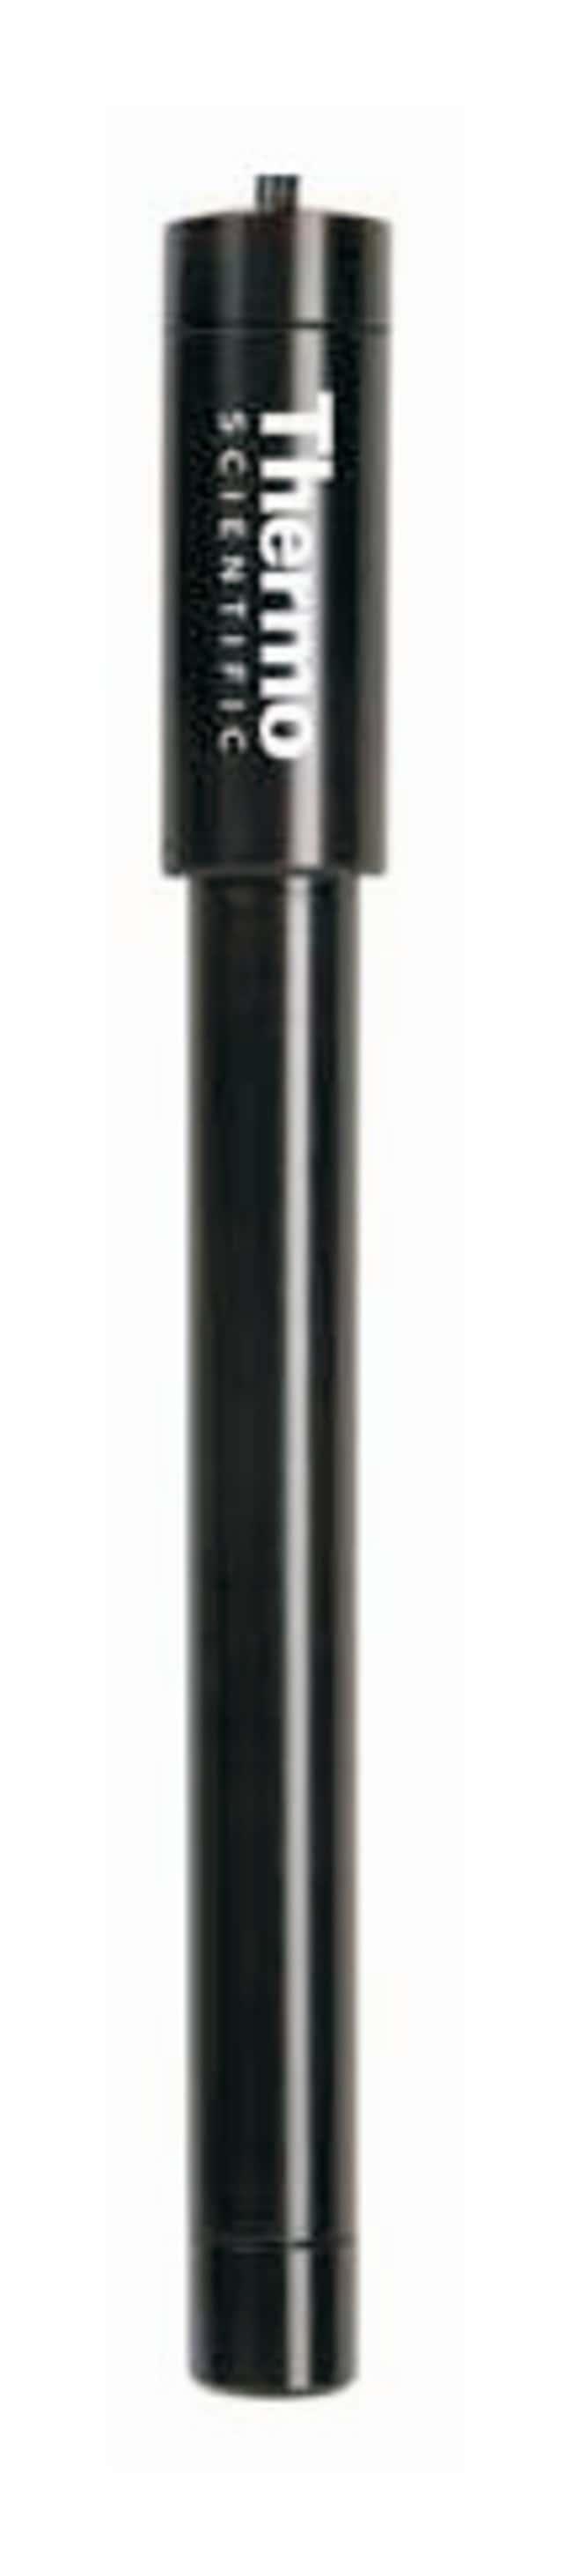 Thermo Scientific™Orion™ Ammonia Gas Sensing ISE Electrodes